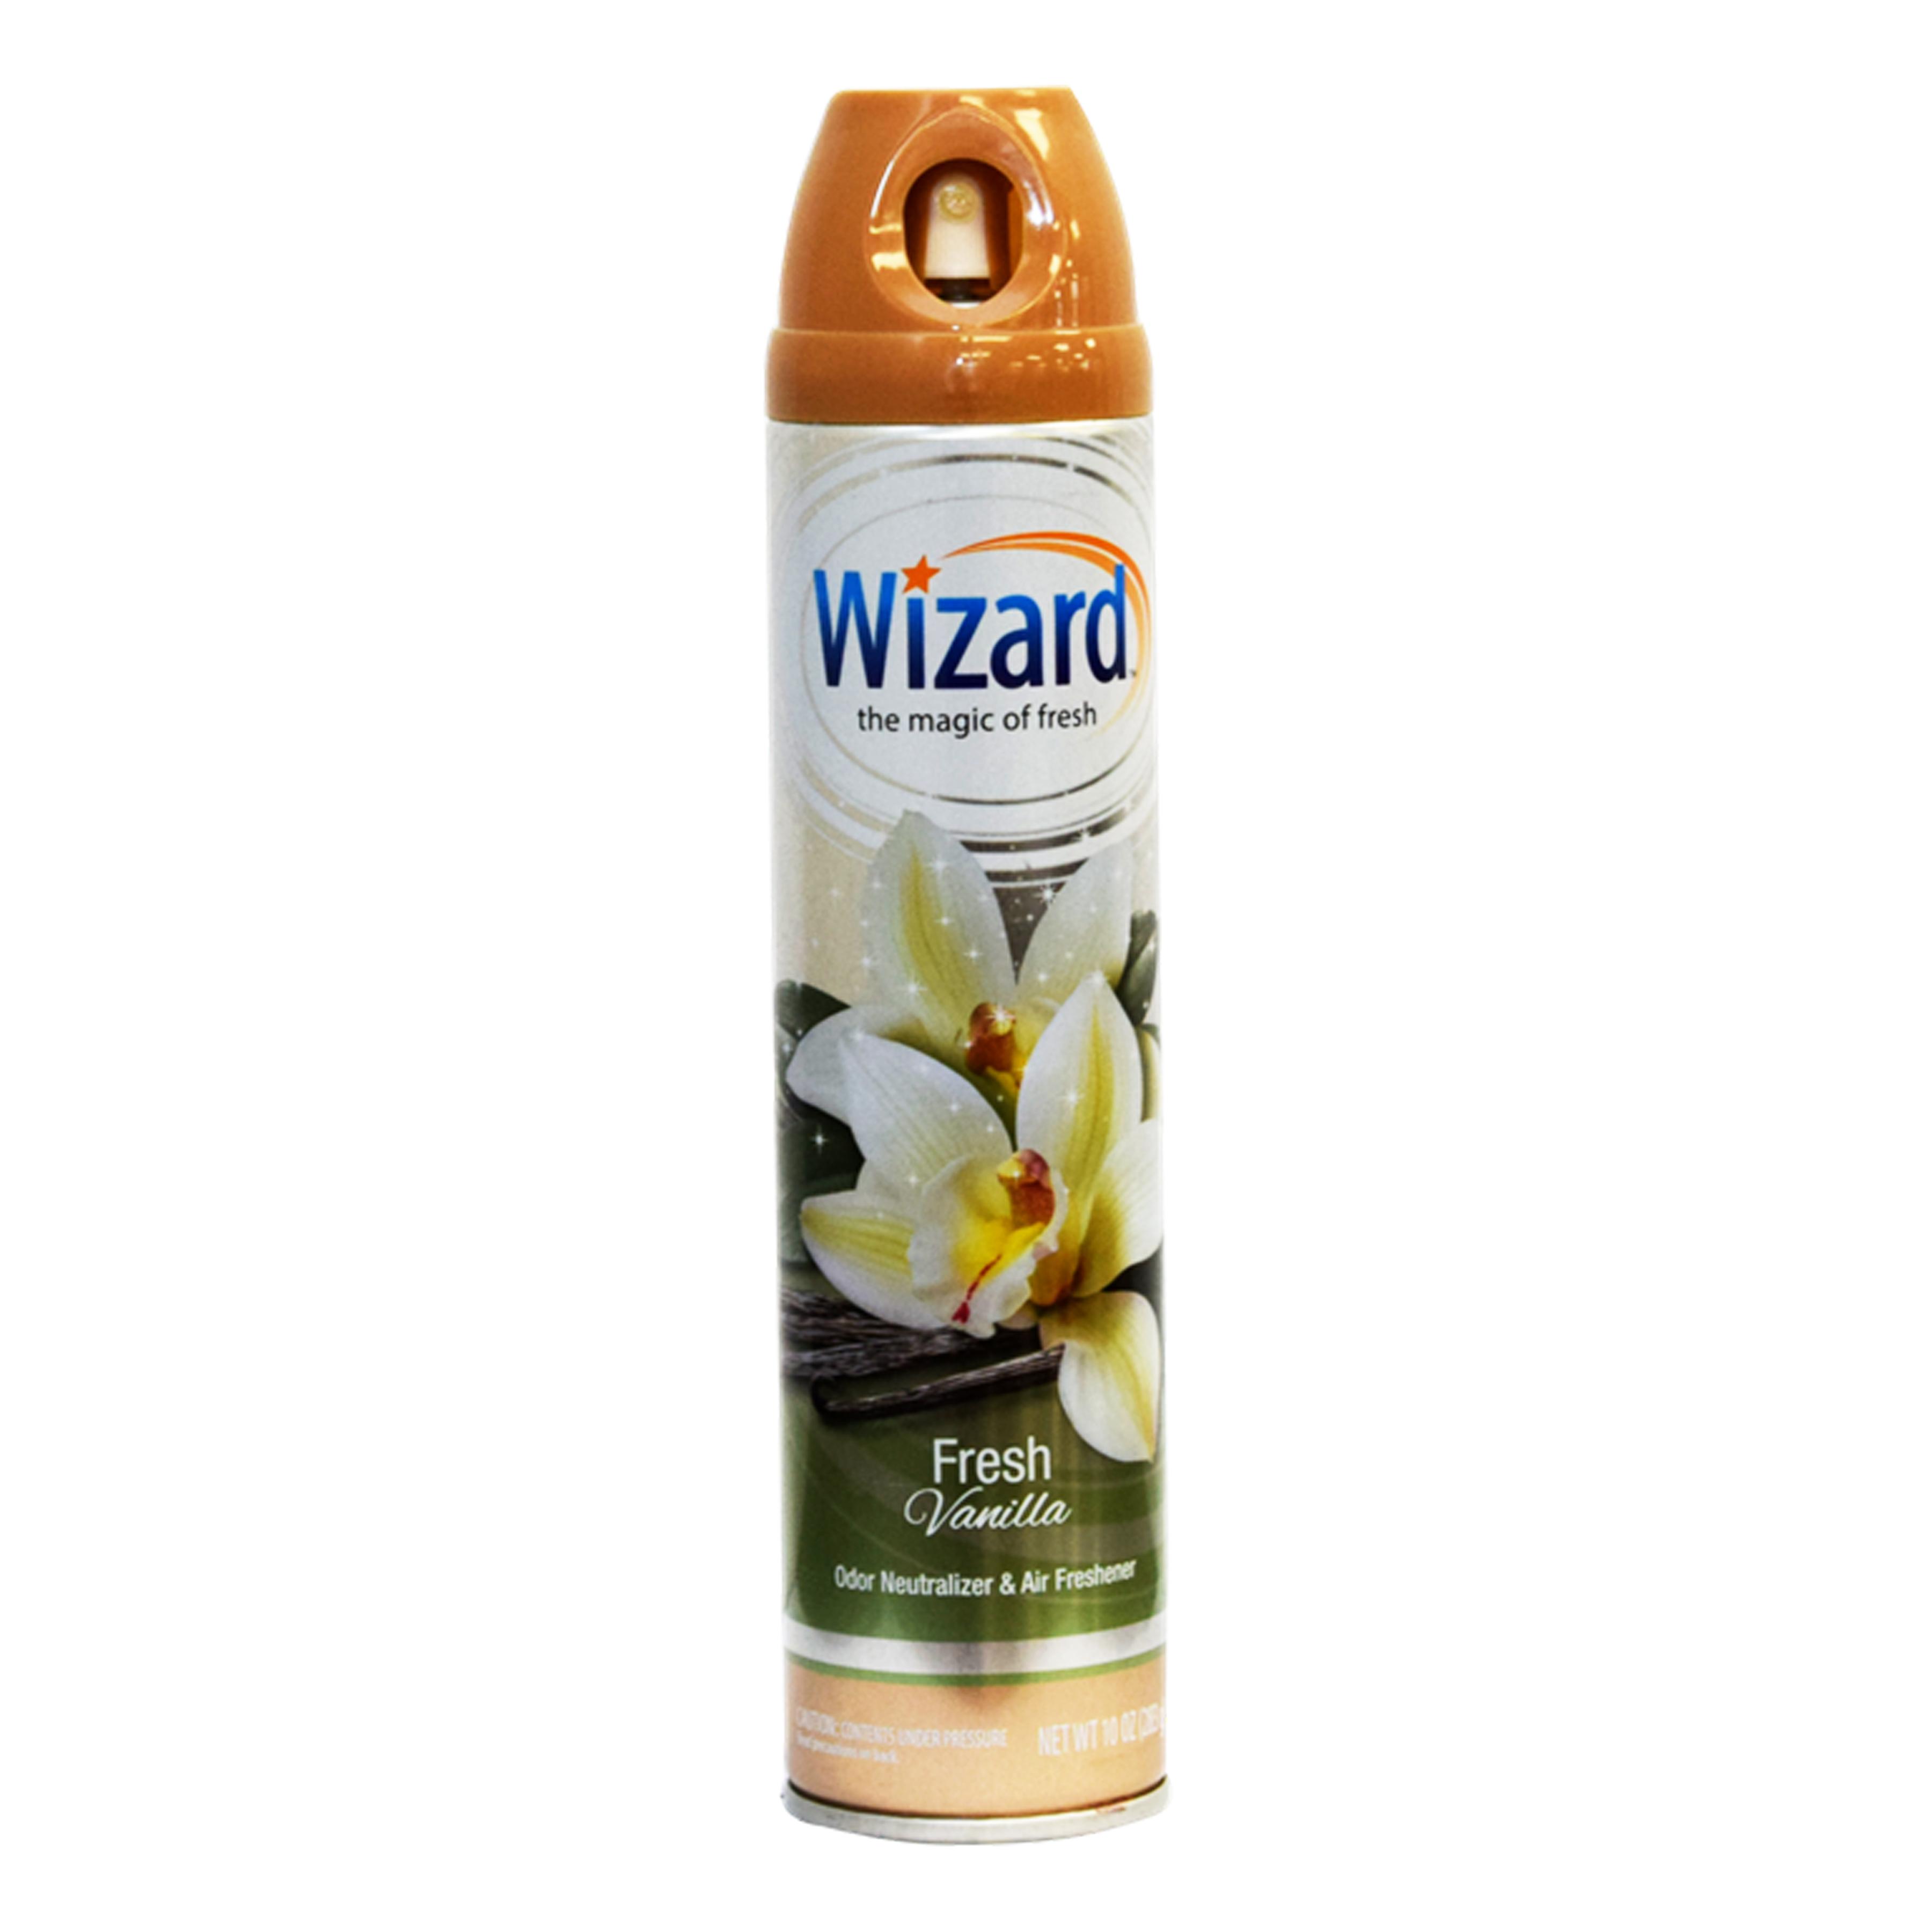 Wizard 10 oz. Aerosol Spray, Fresh Vanilla